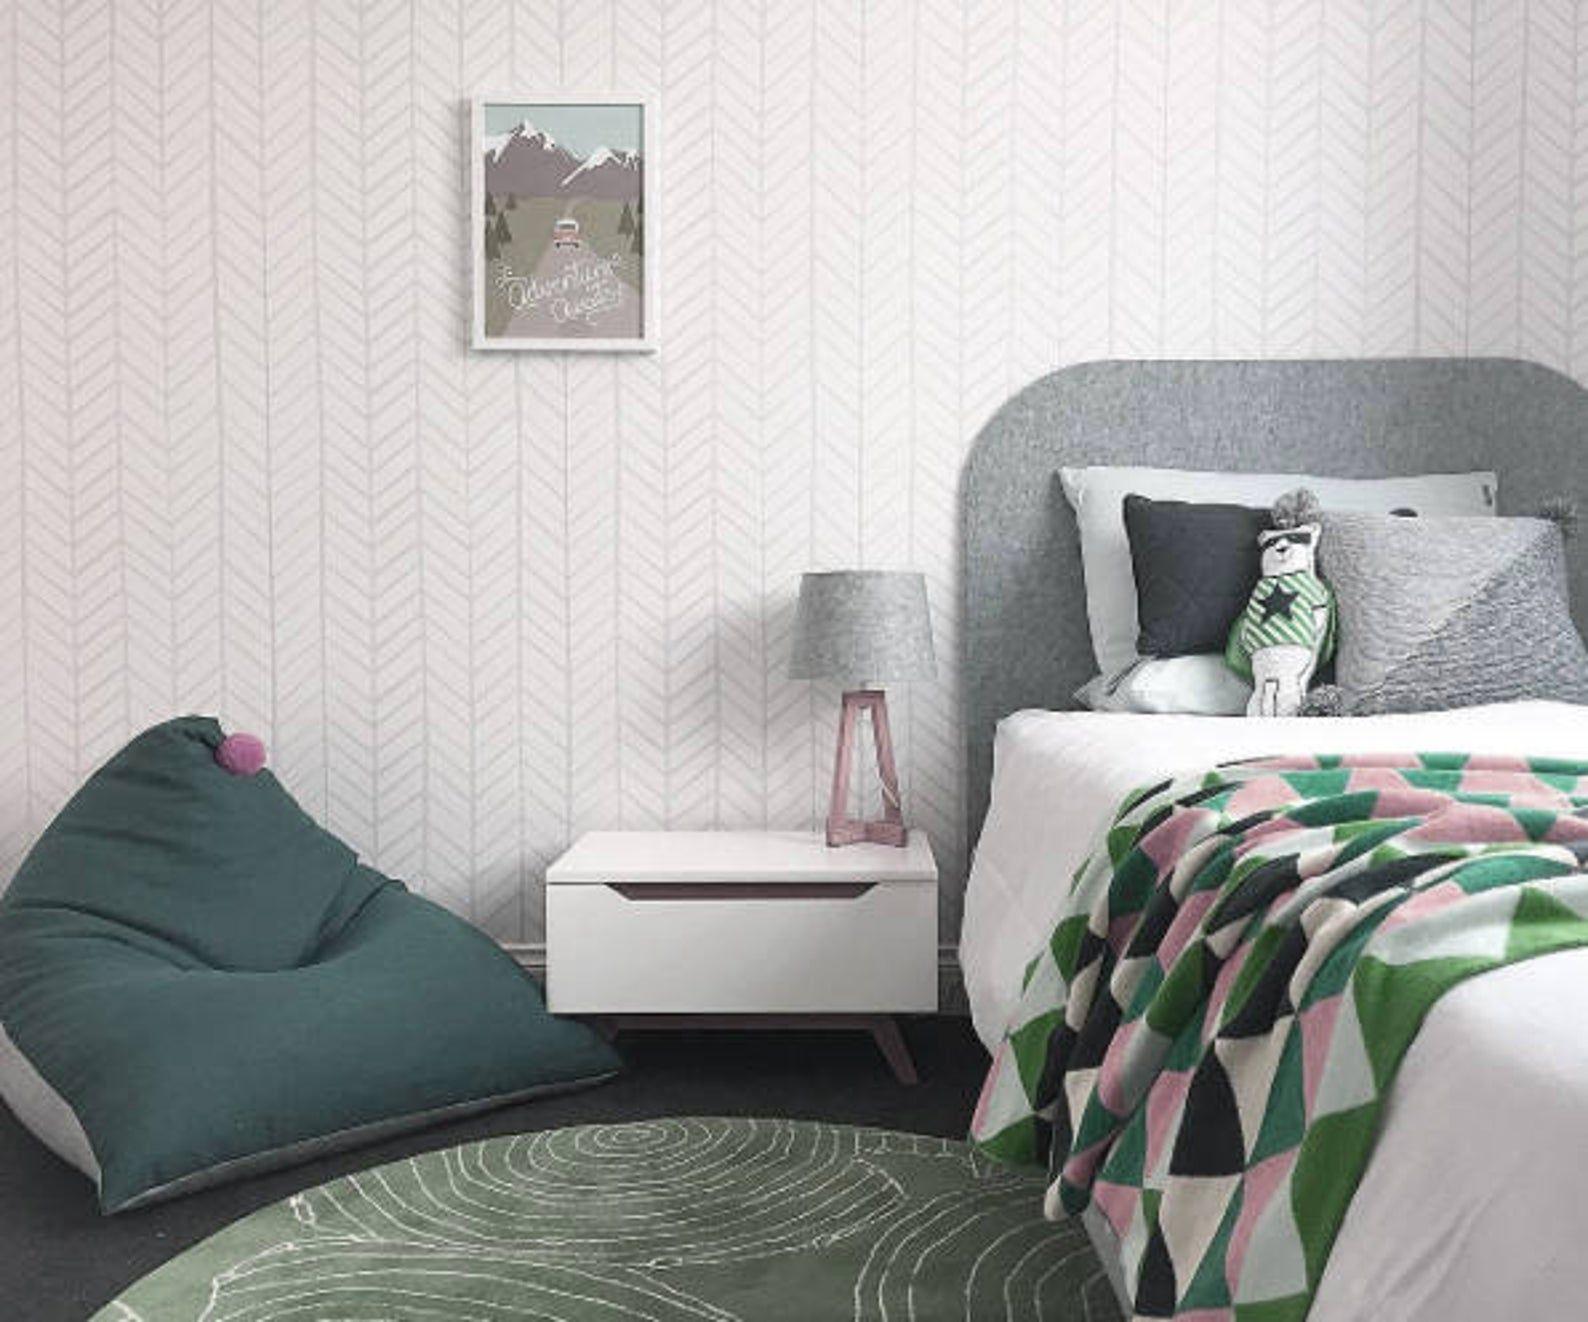 Removable Wallpaper Peel and stick Herringbone wallpaper